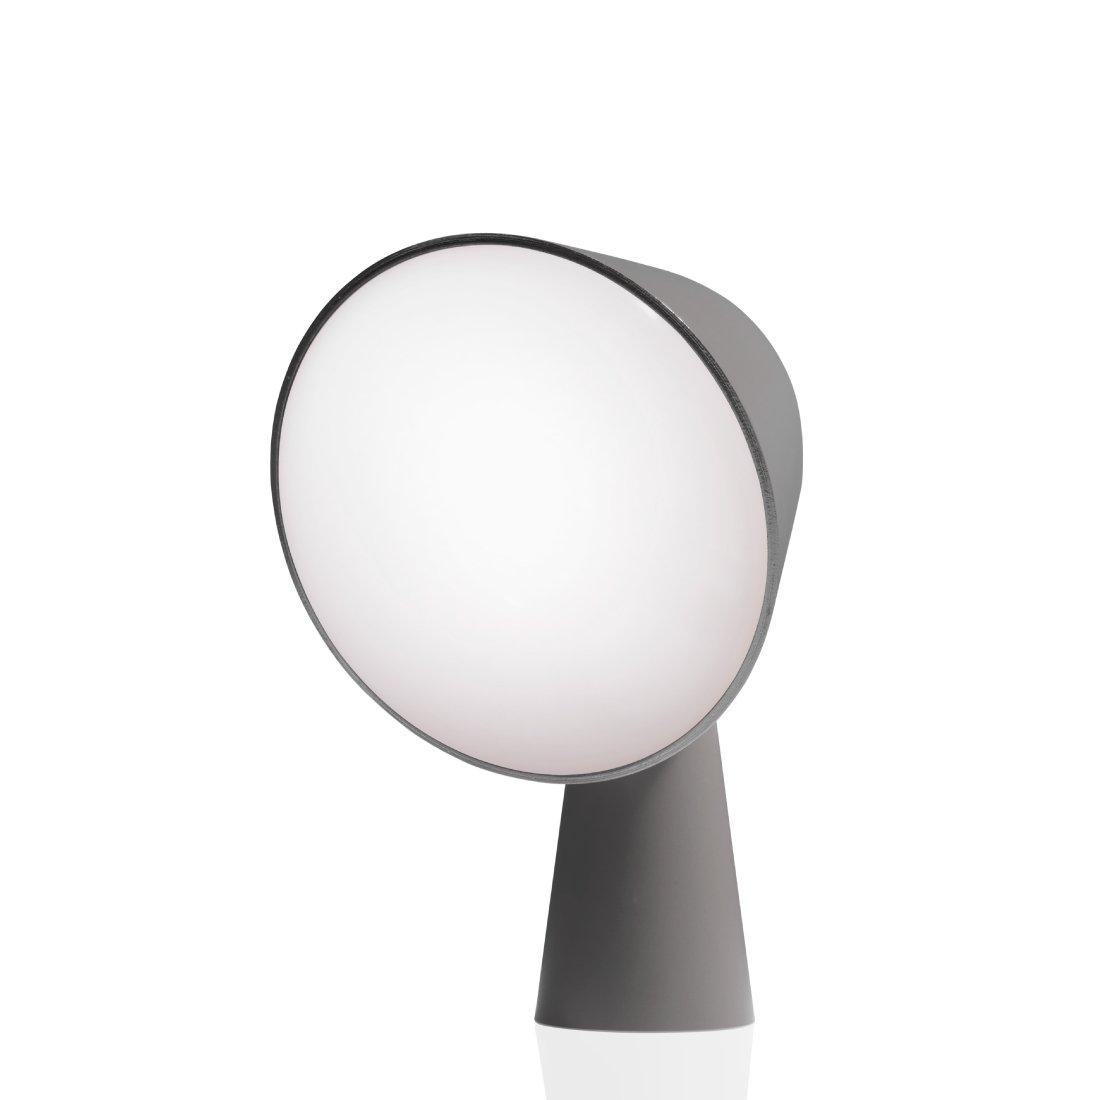 Foscarini Binic Tafellamp Antraciet